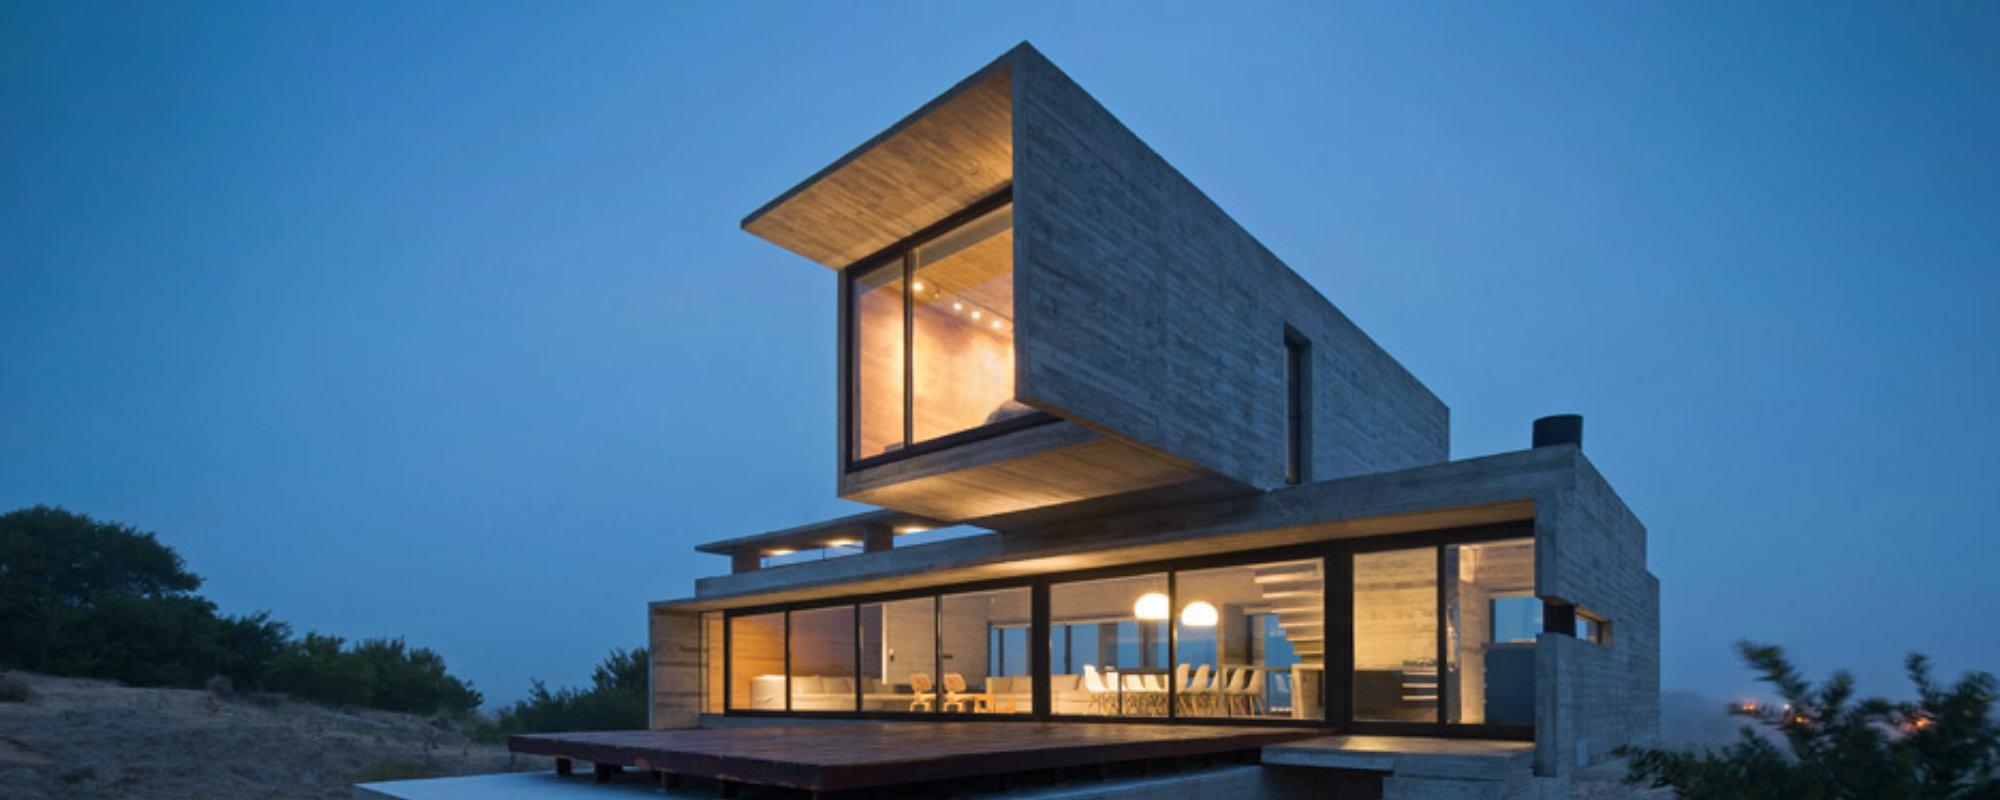 Luciano Kruk: un arquitecto de lujo en Argentina  Luciano Kruk: un arquitecto de lujo en Argentina Featured